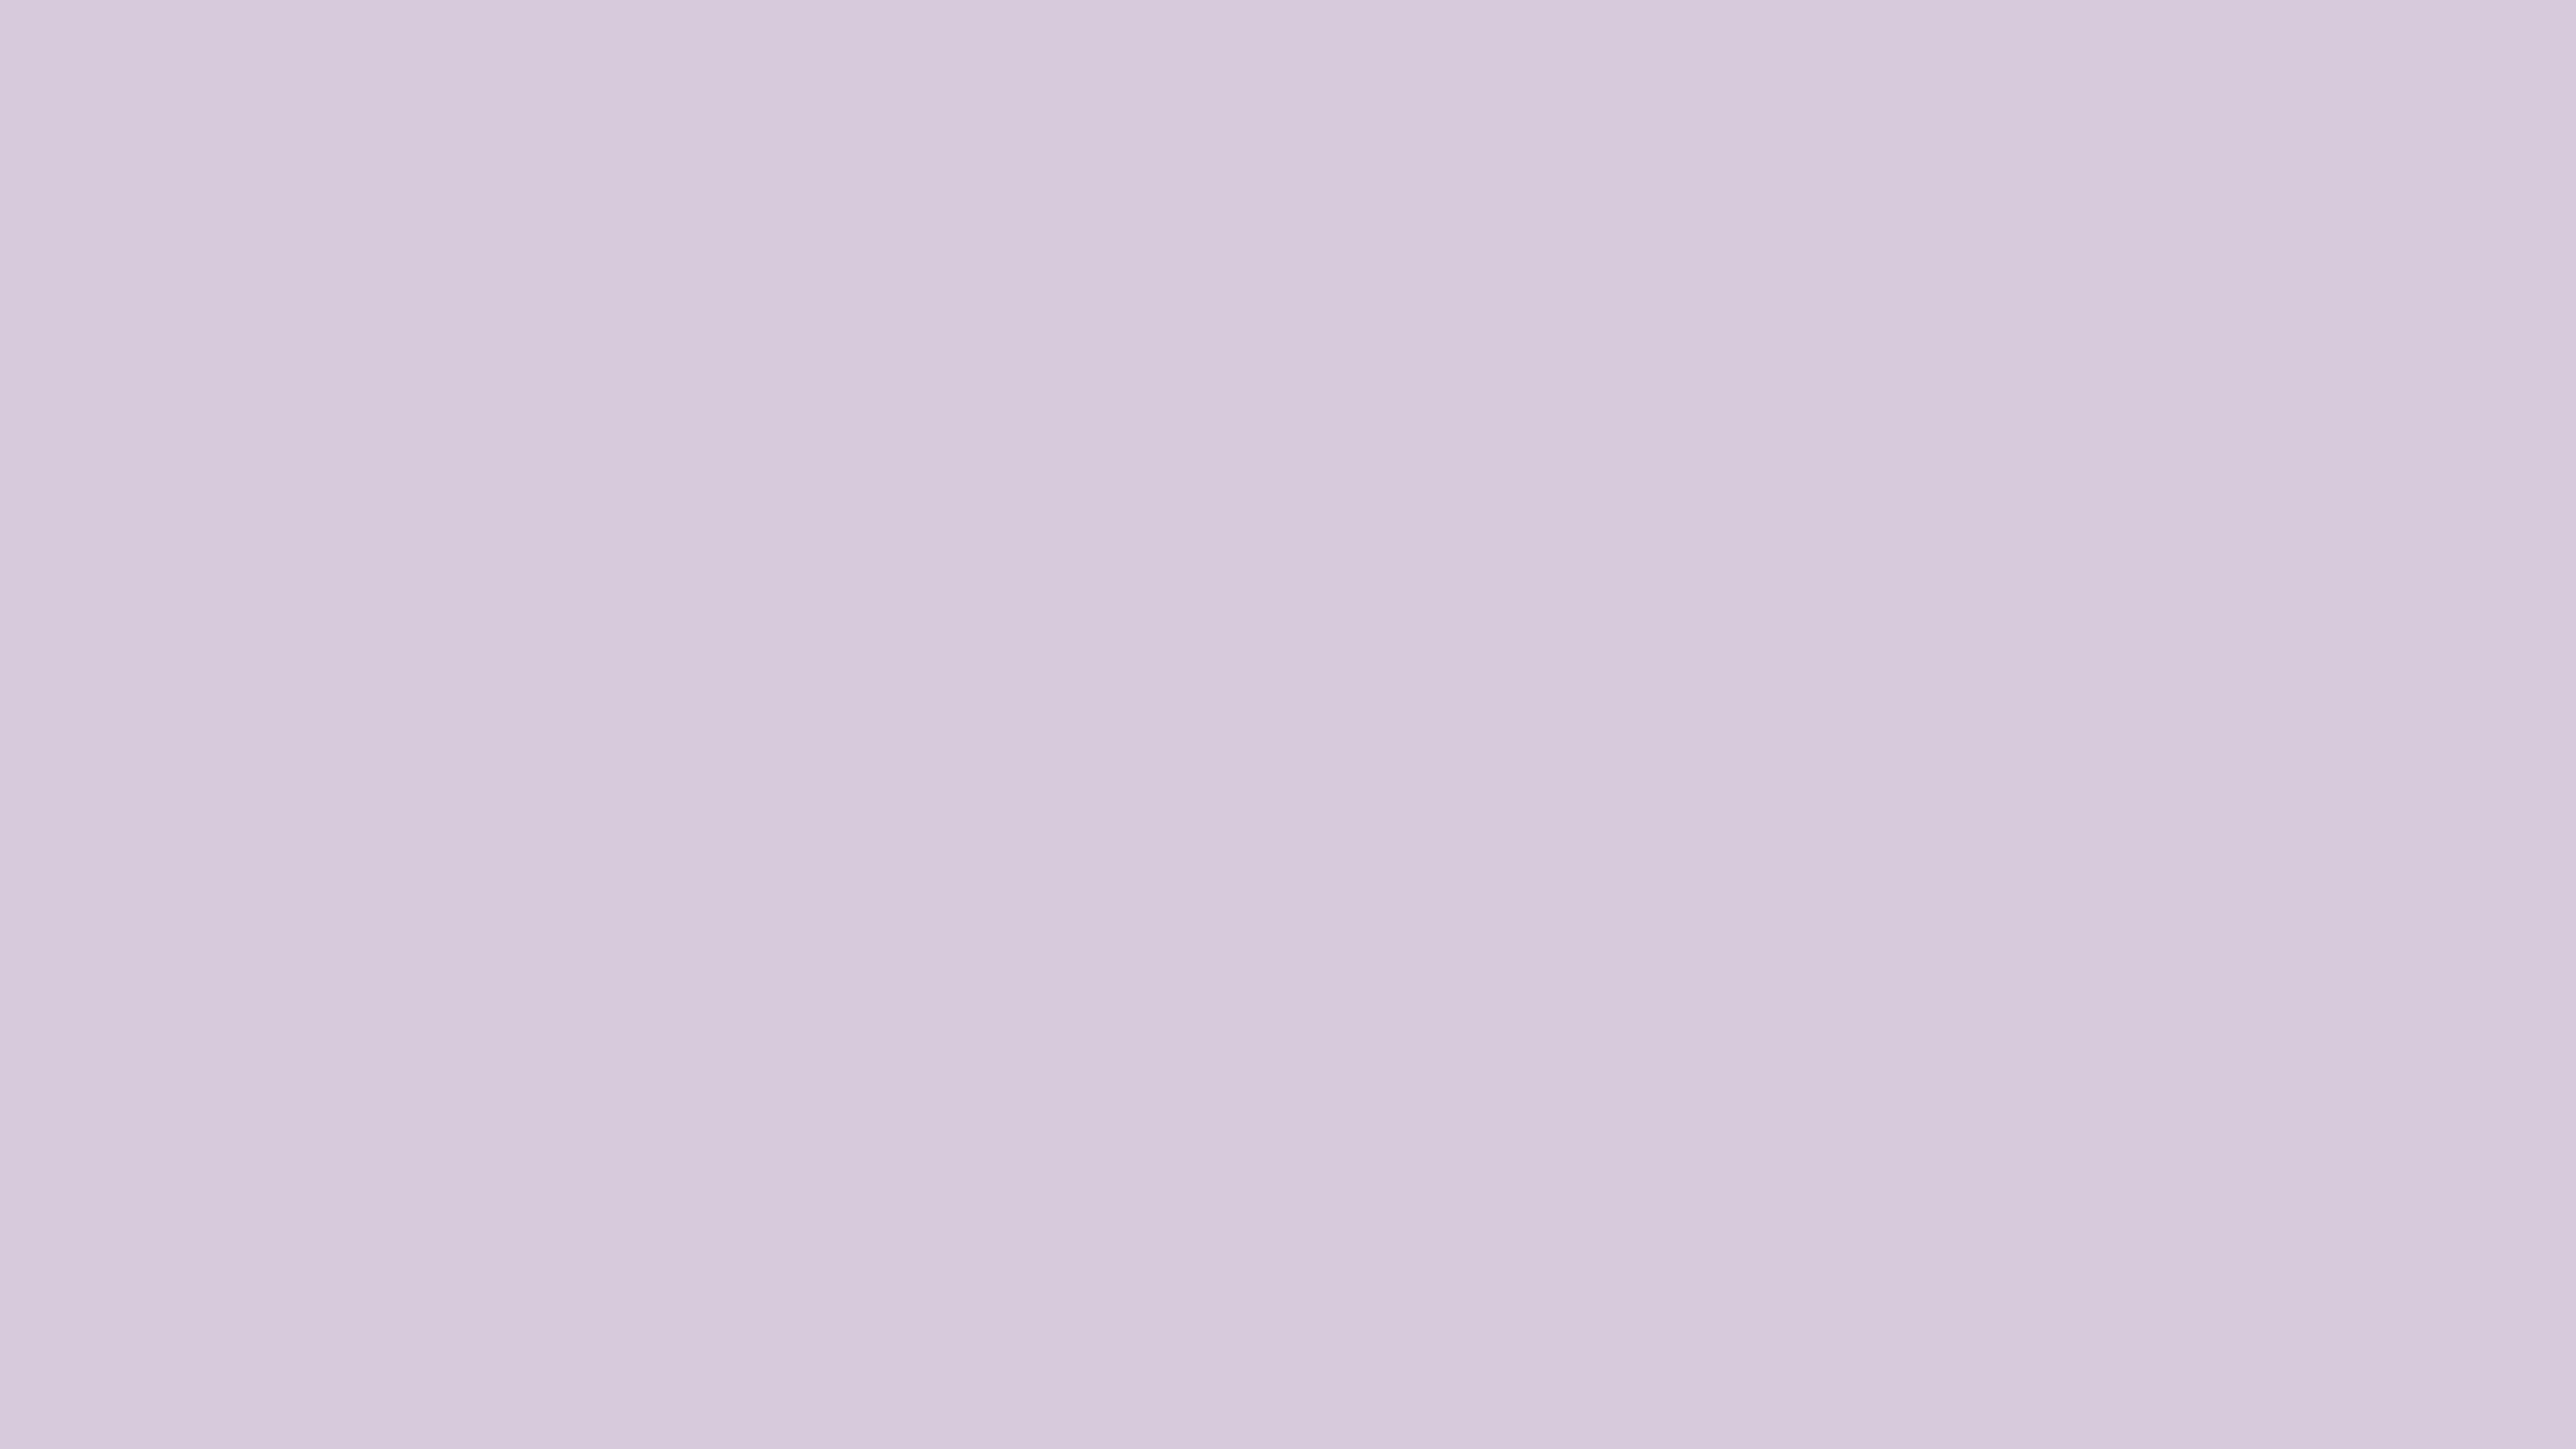 3840x2160 Languid Lavender Solid Color Background